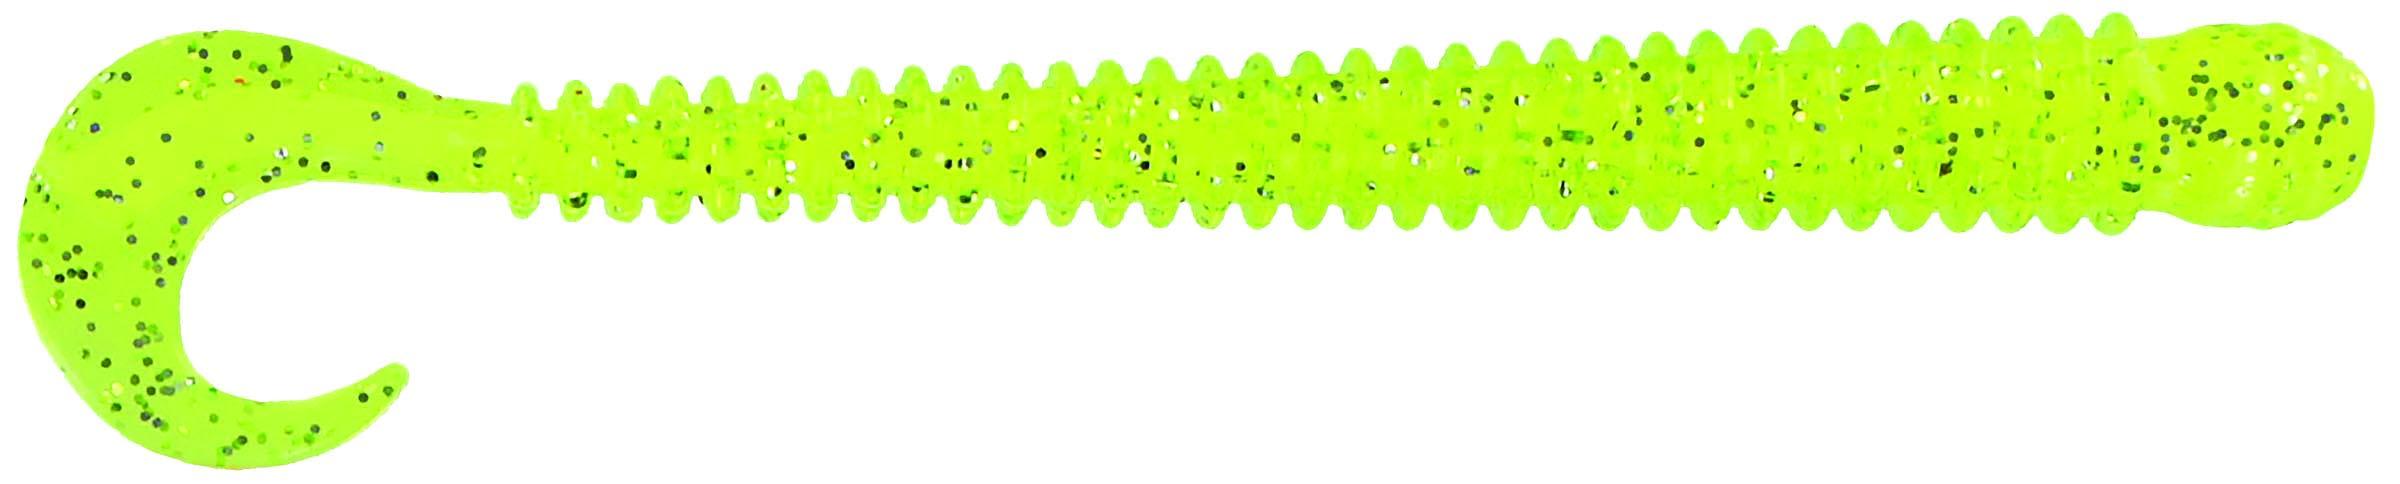 Big Bite Baits - Disc Ring Worm - 4 inch - RW-429 - CHART WHITE CORE